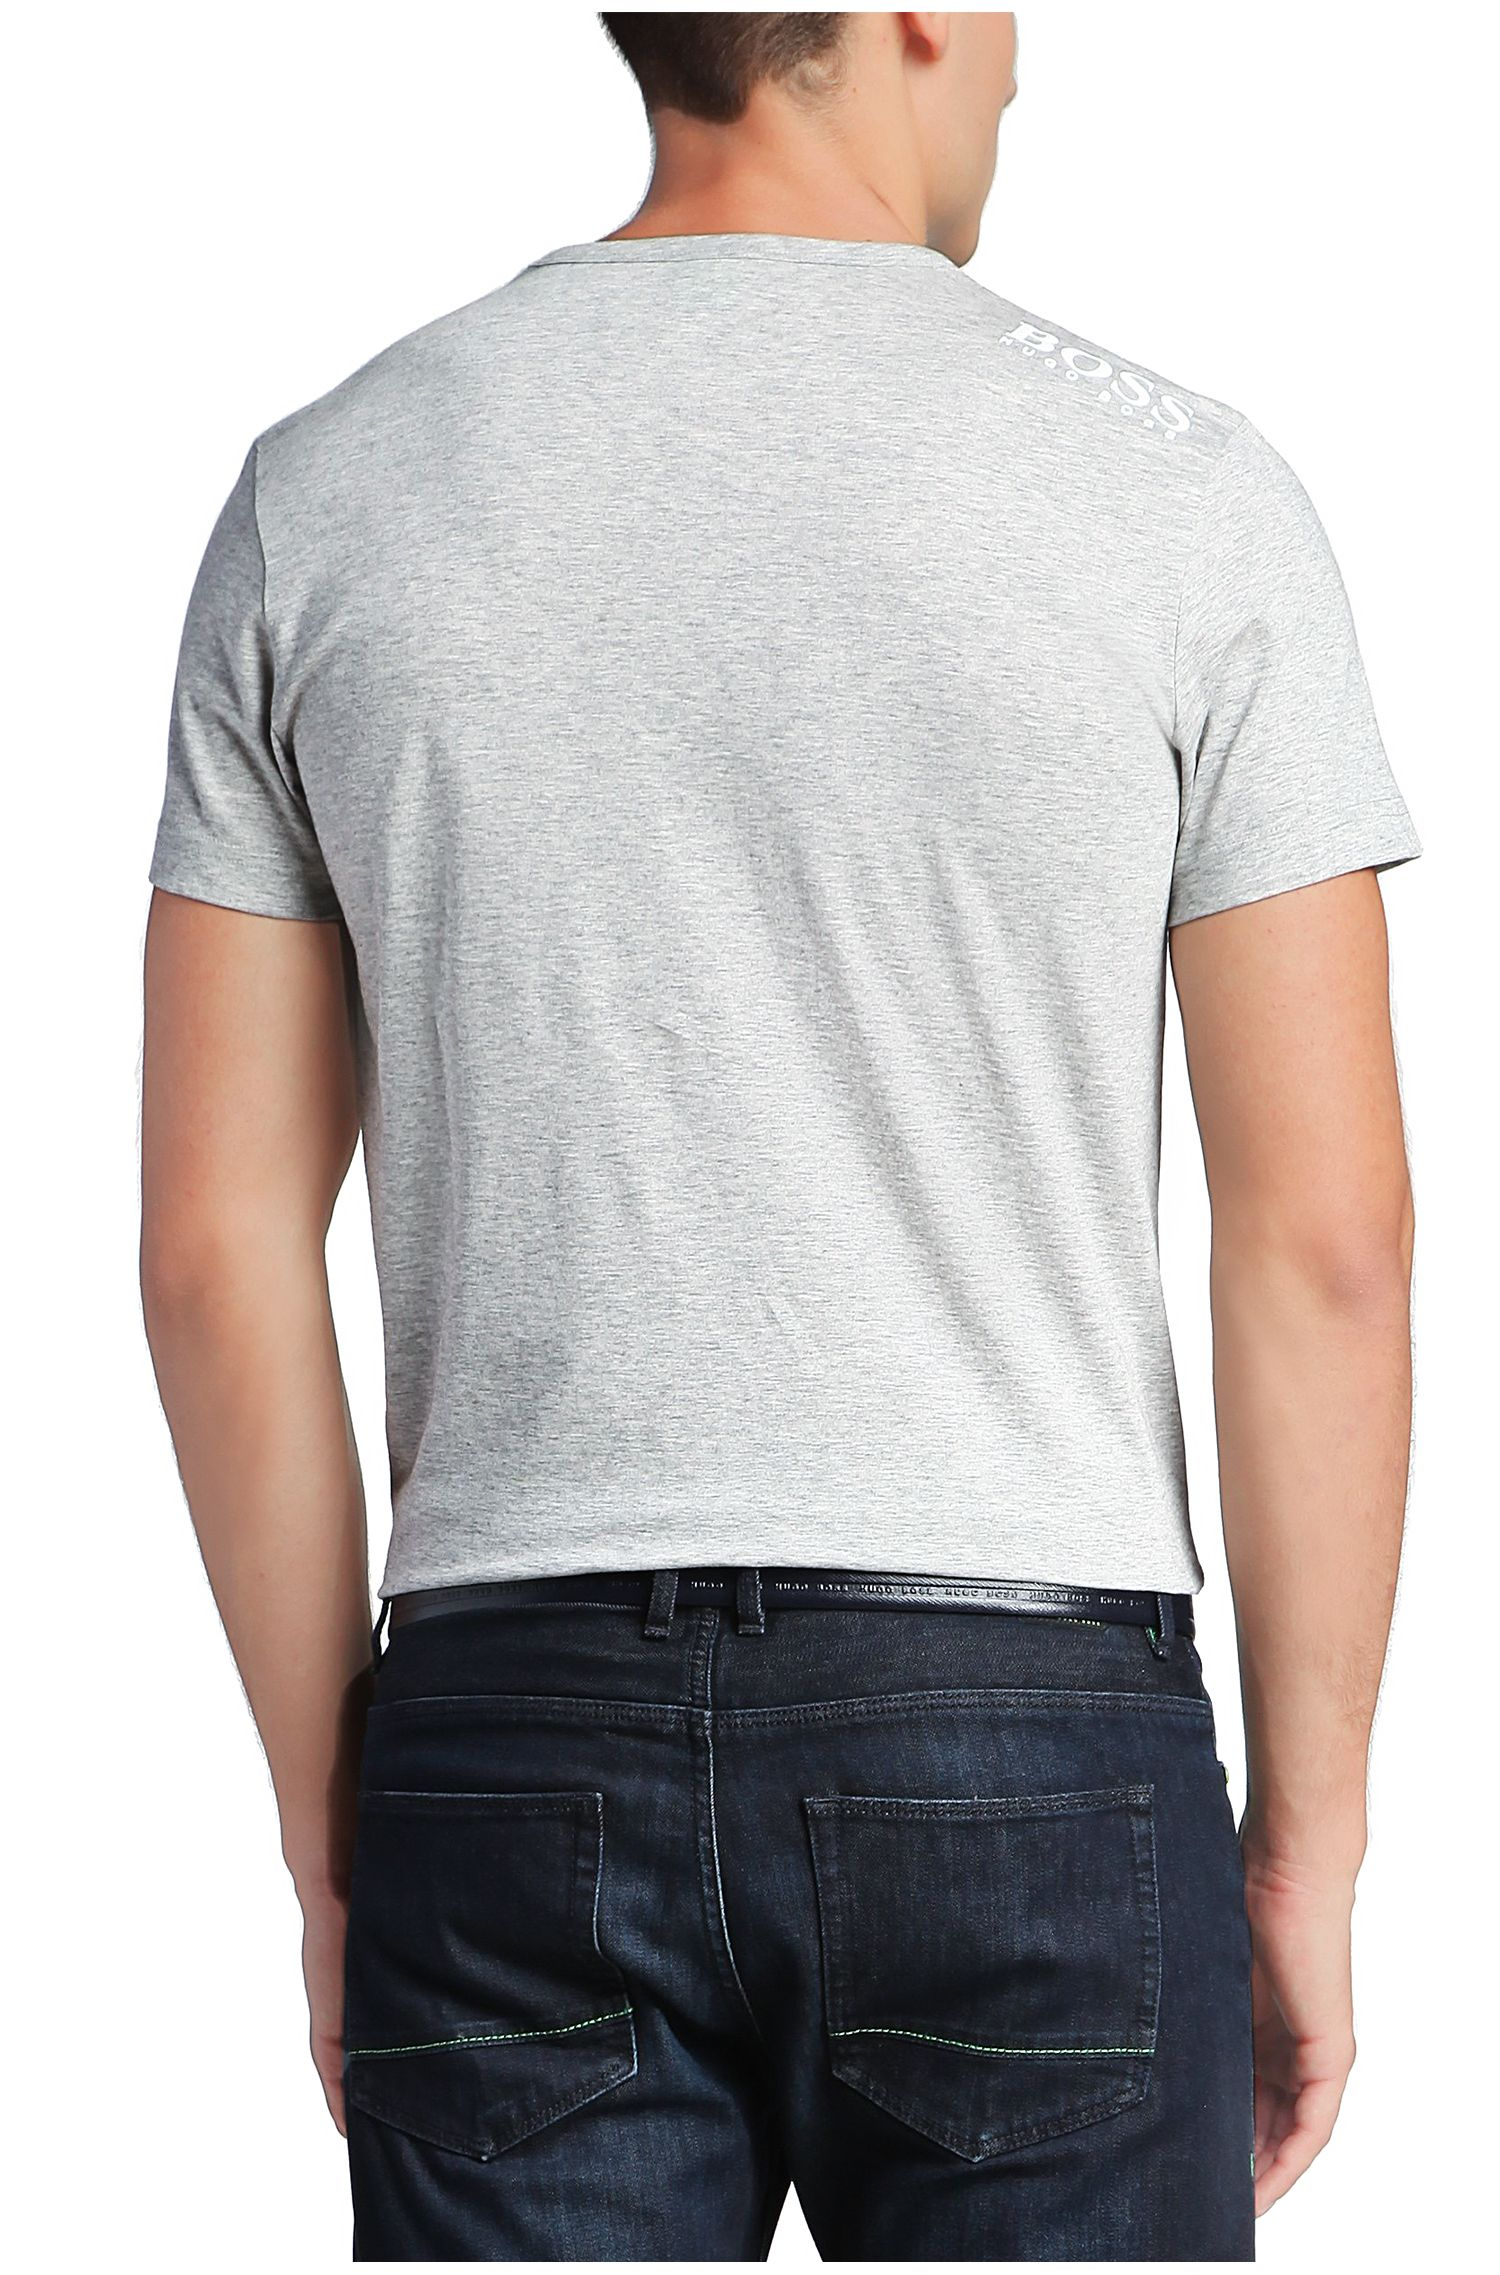 T-Shirt aus softer Baumwolle mit V-Ausschnitt, Hellgrau